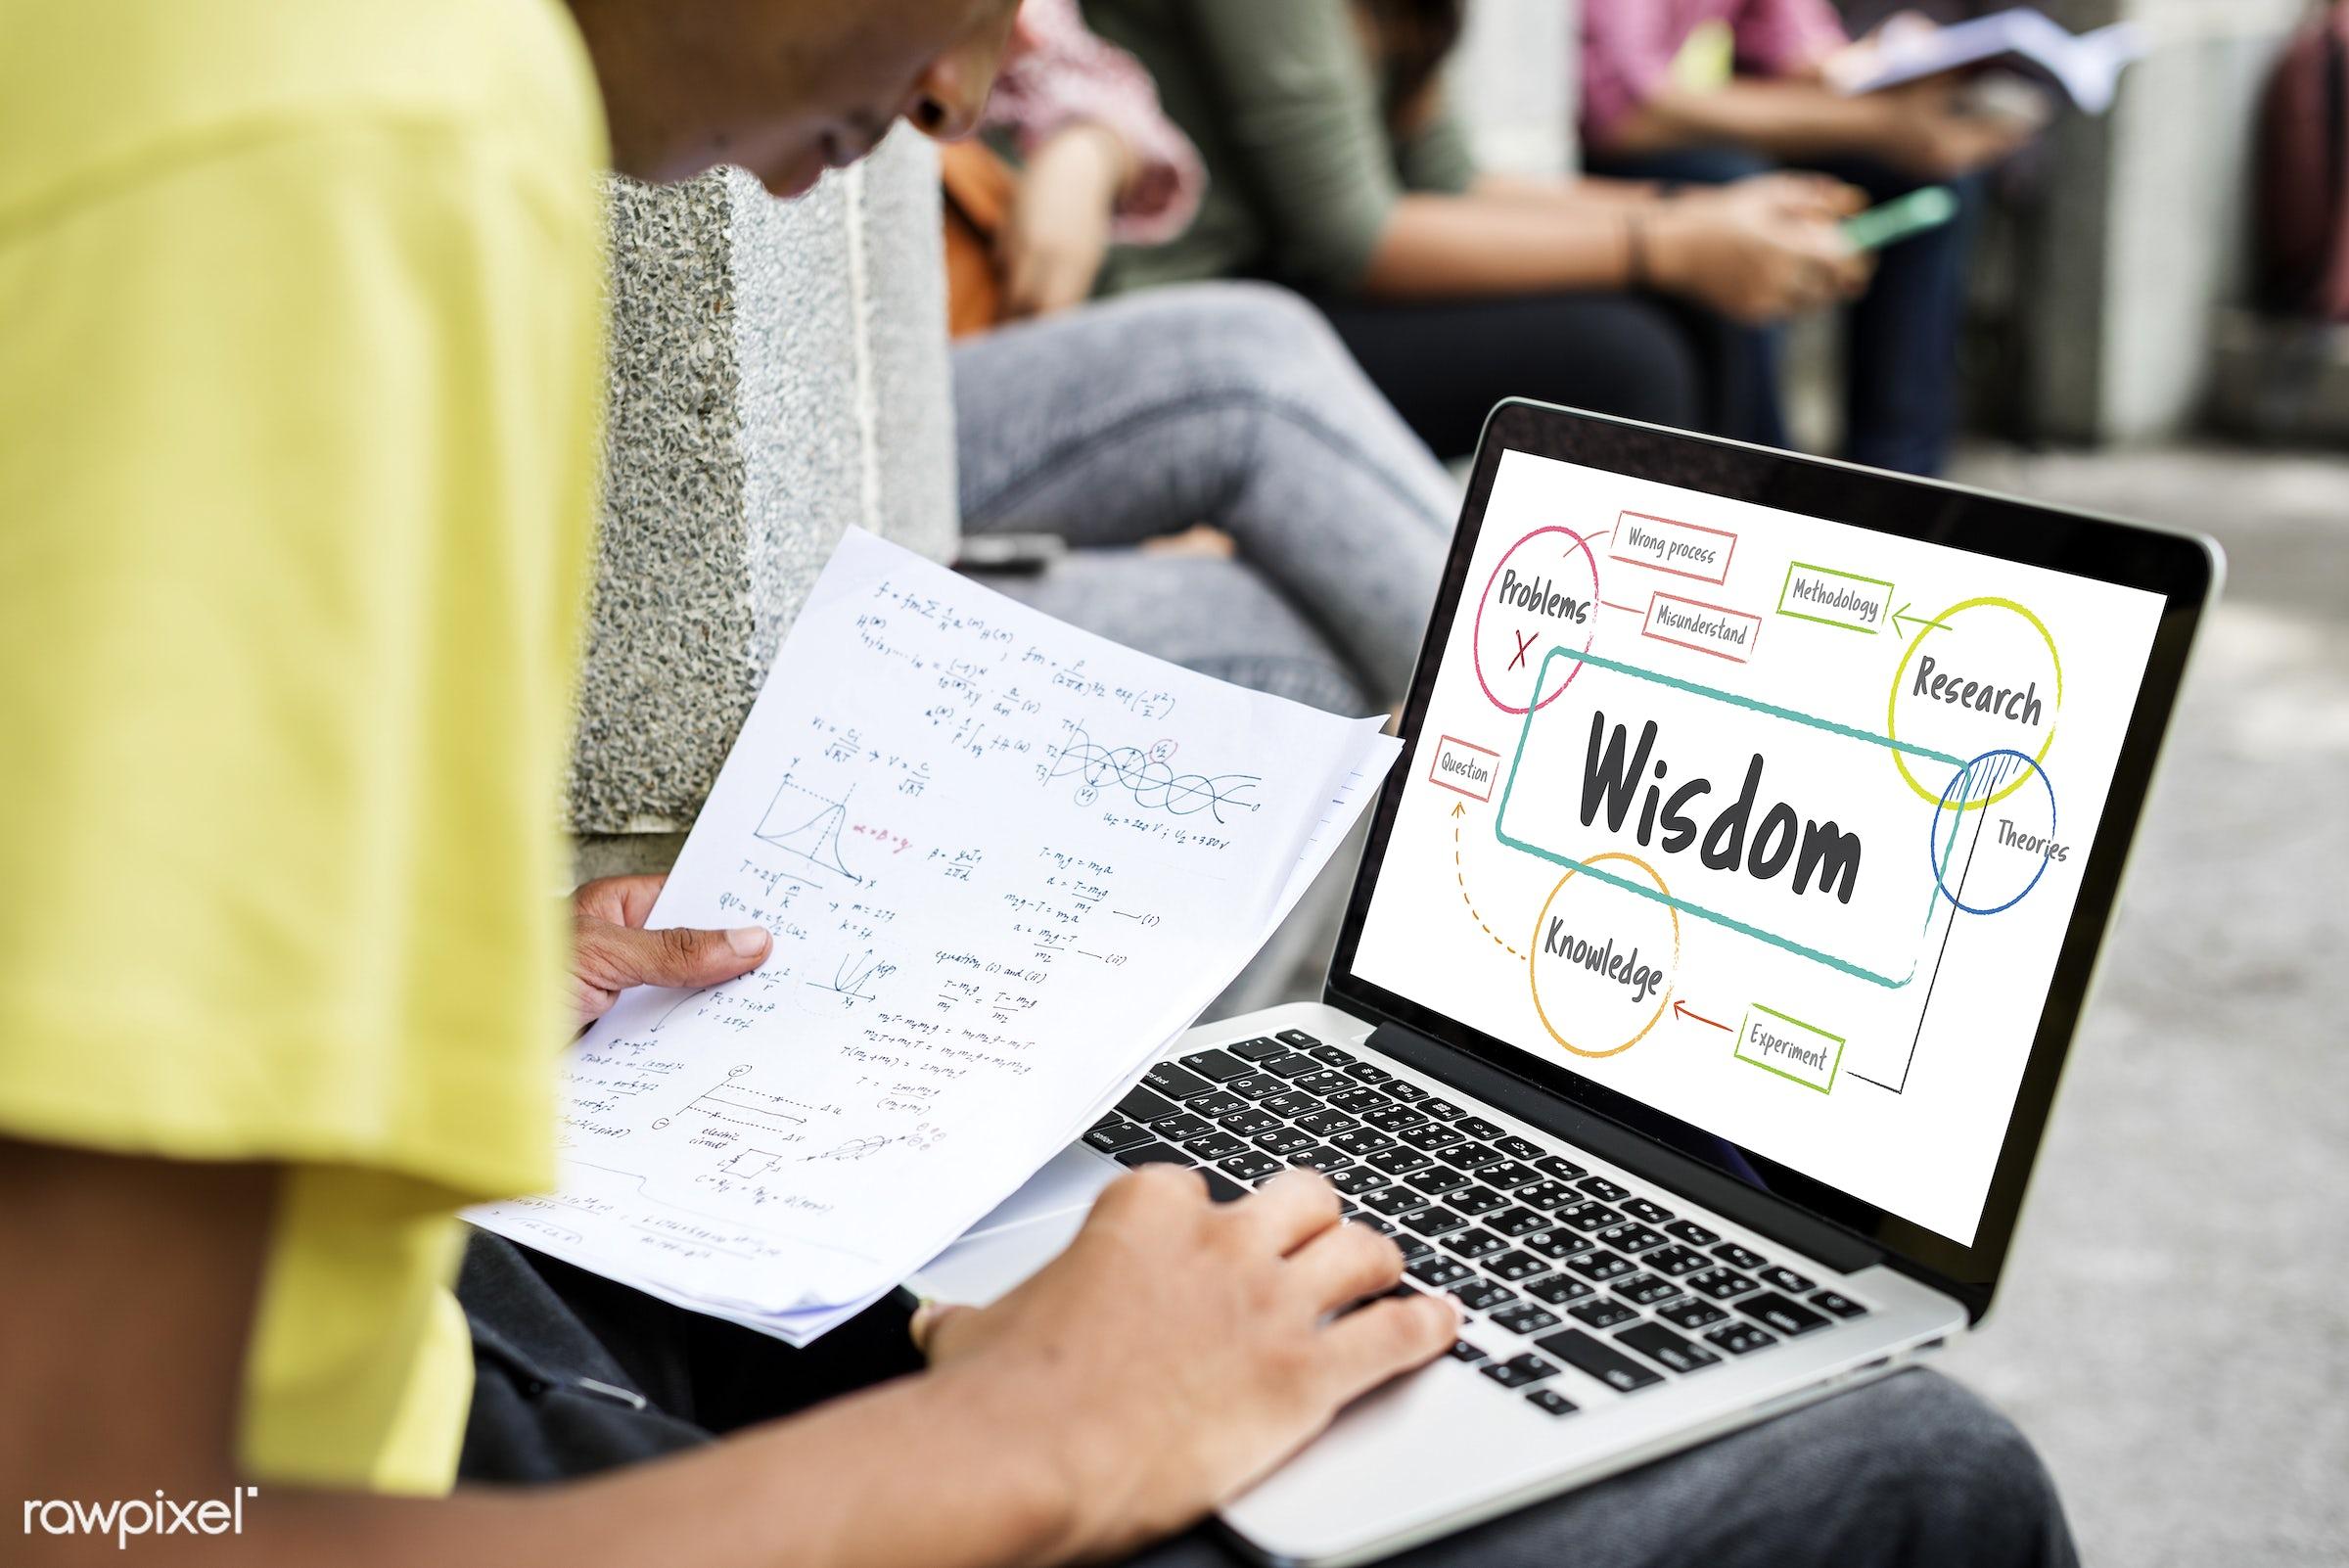 academics, boy, calculation, chart, diagram, digital device, education, evaluation, experiment, gadget, graph, guy, holding...